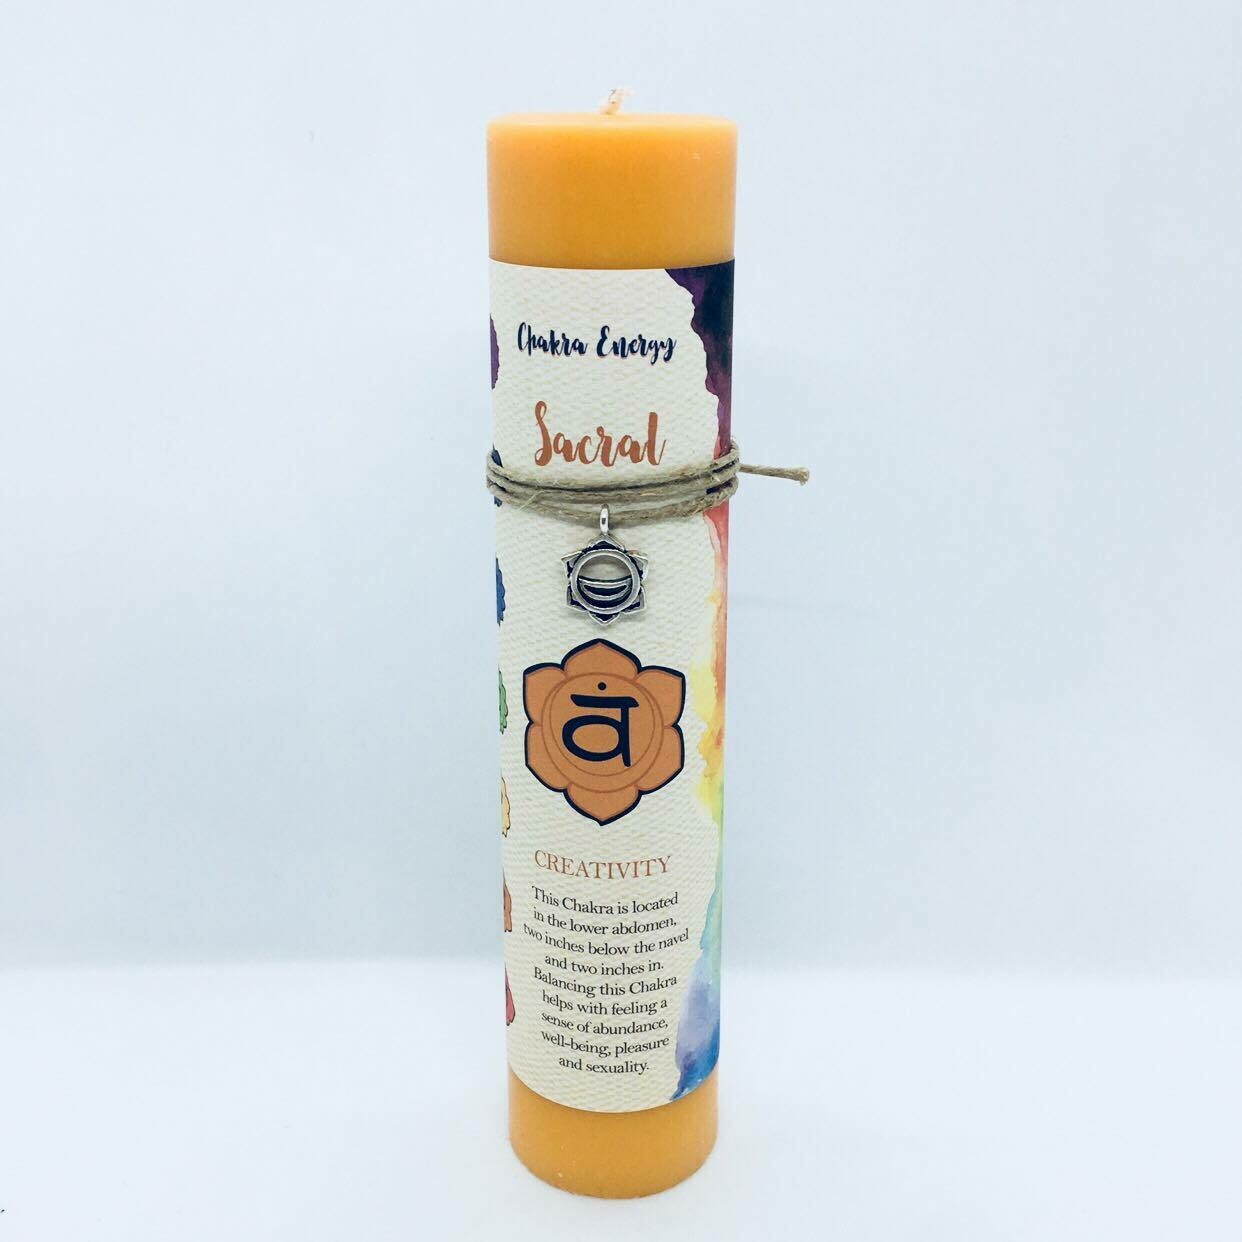 Chakra Energy Sacral candle pillar